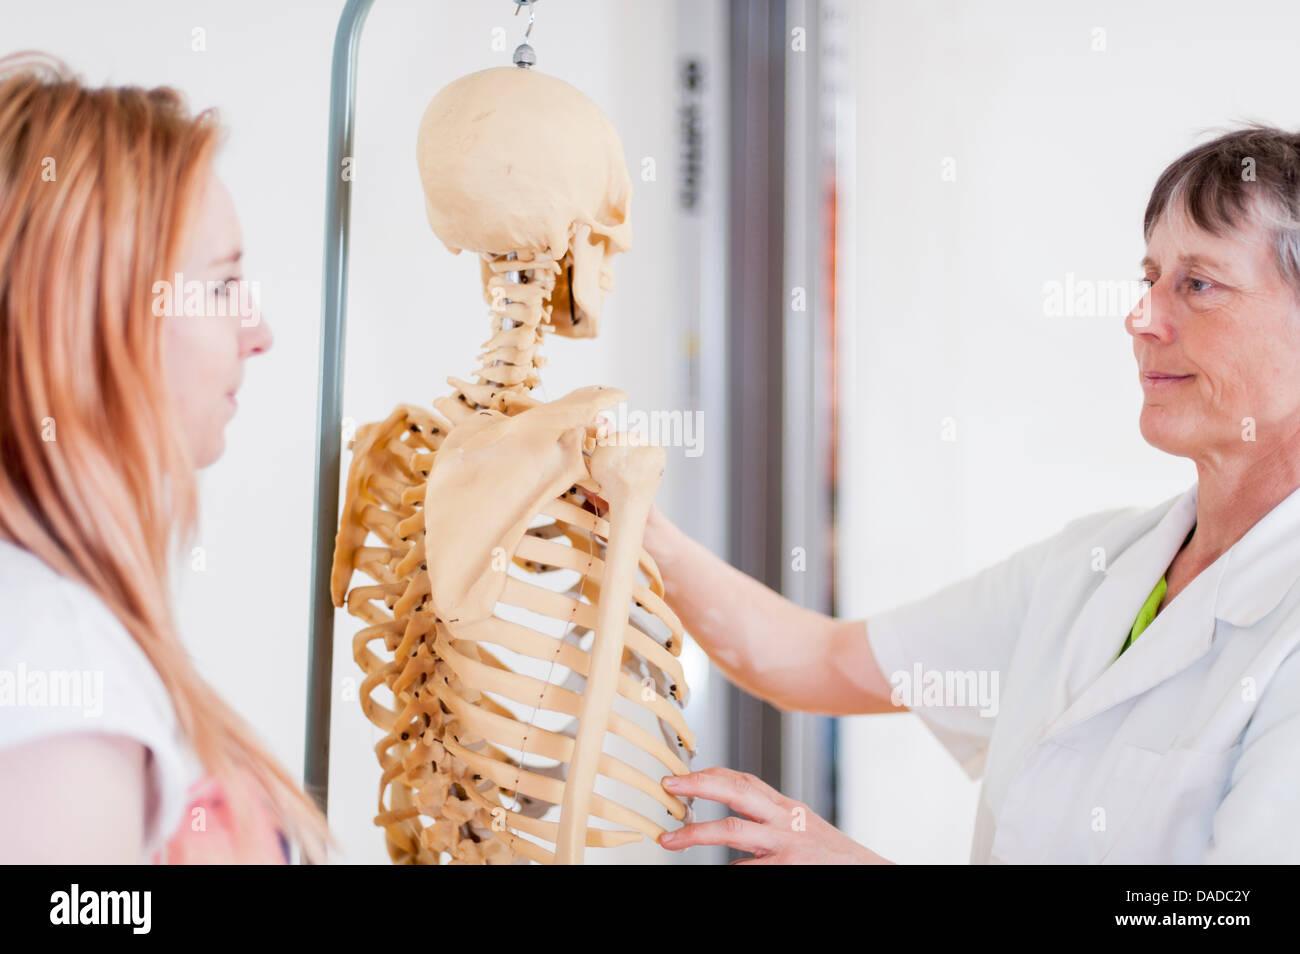 Women looking at anatomical model - Stock Image